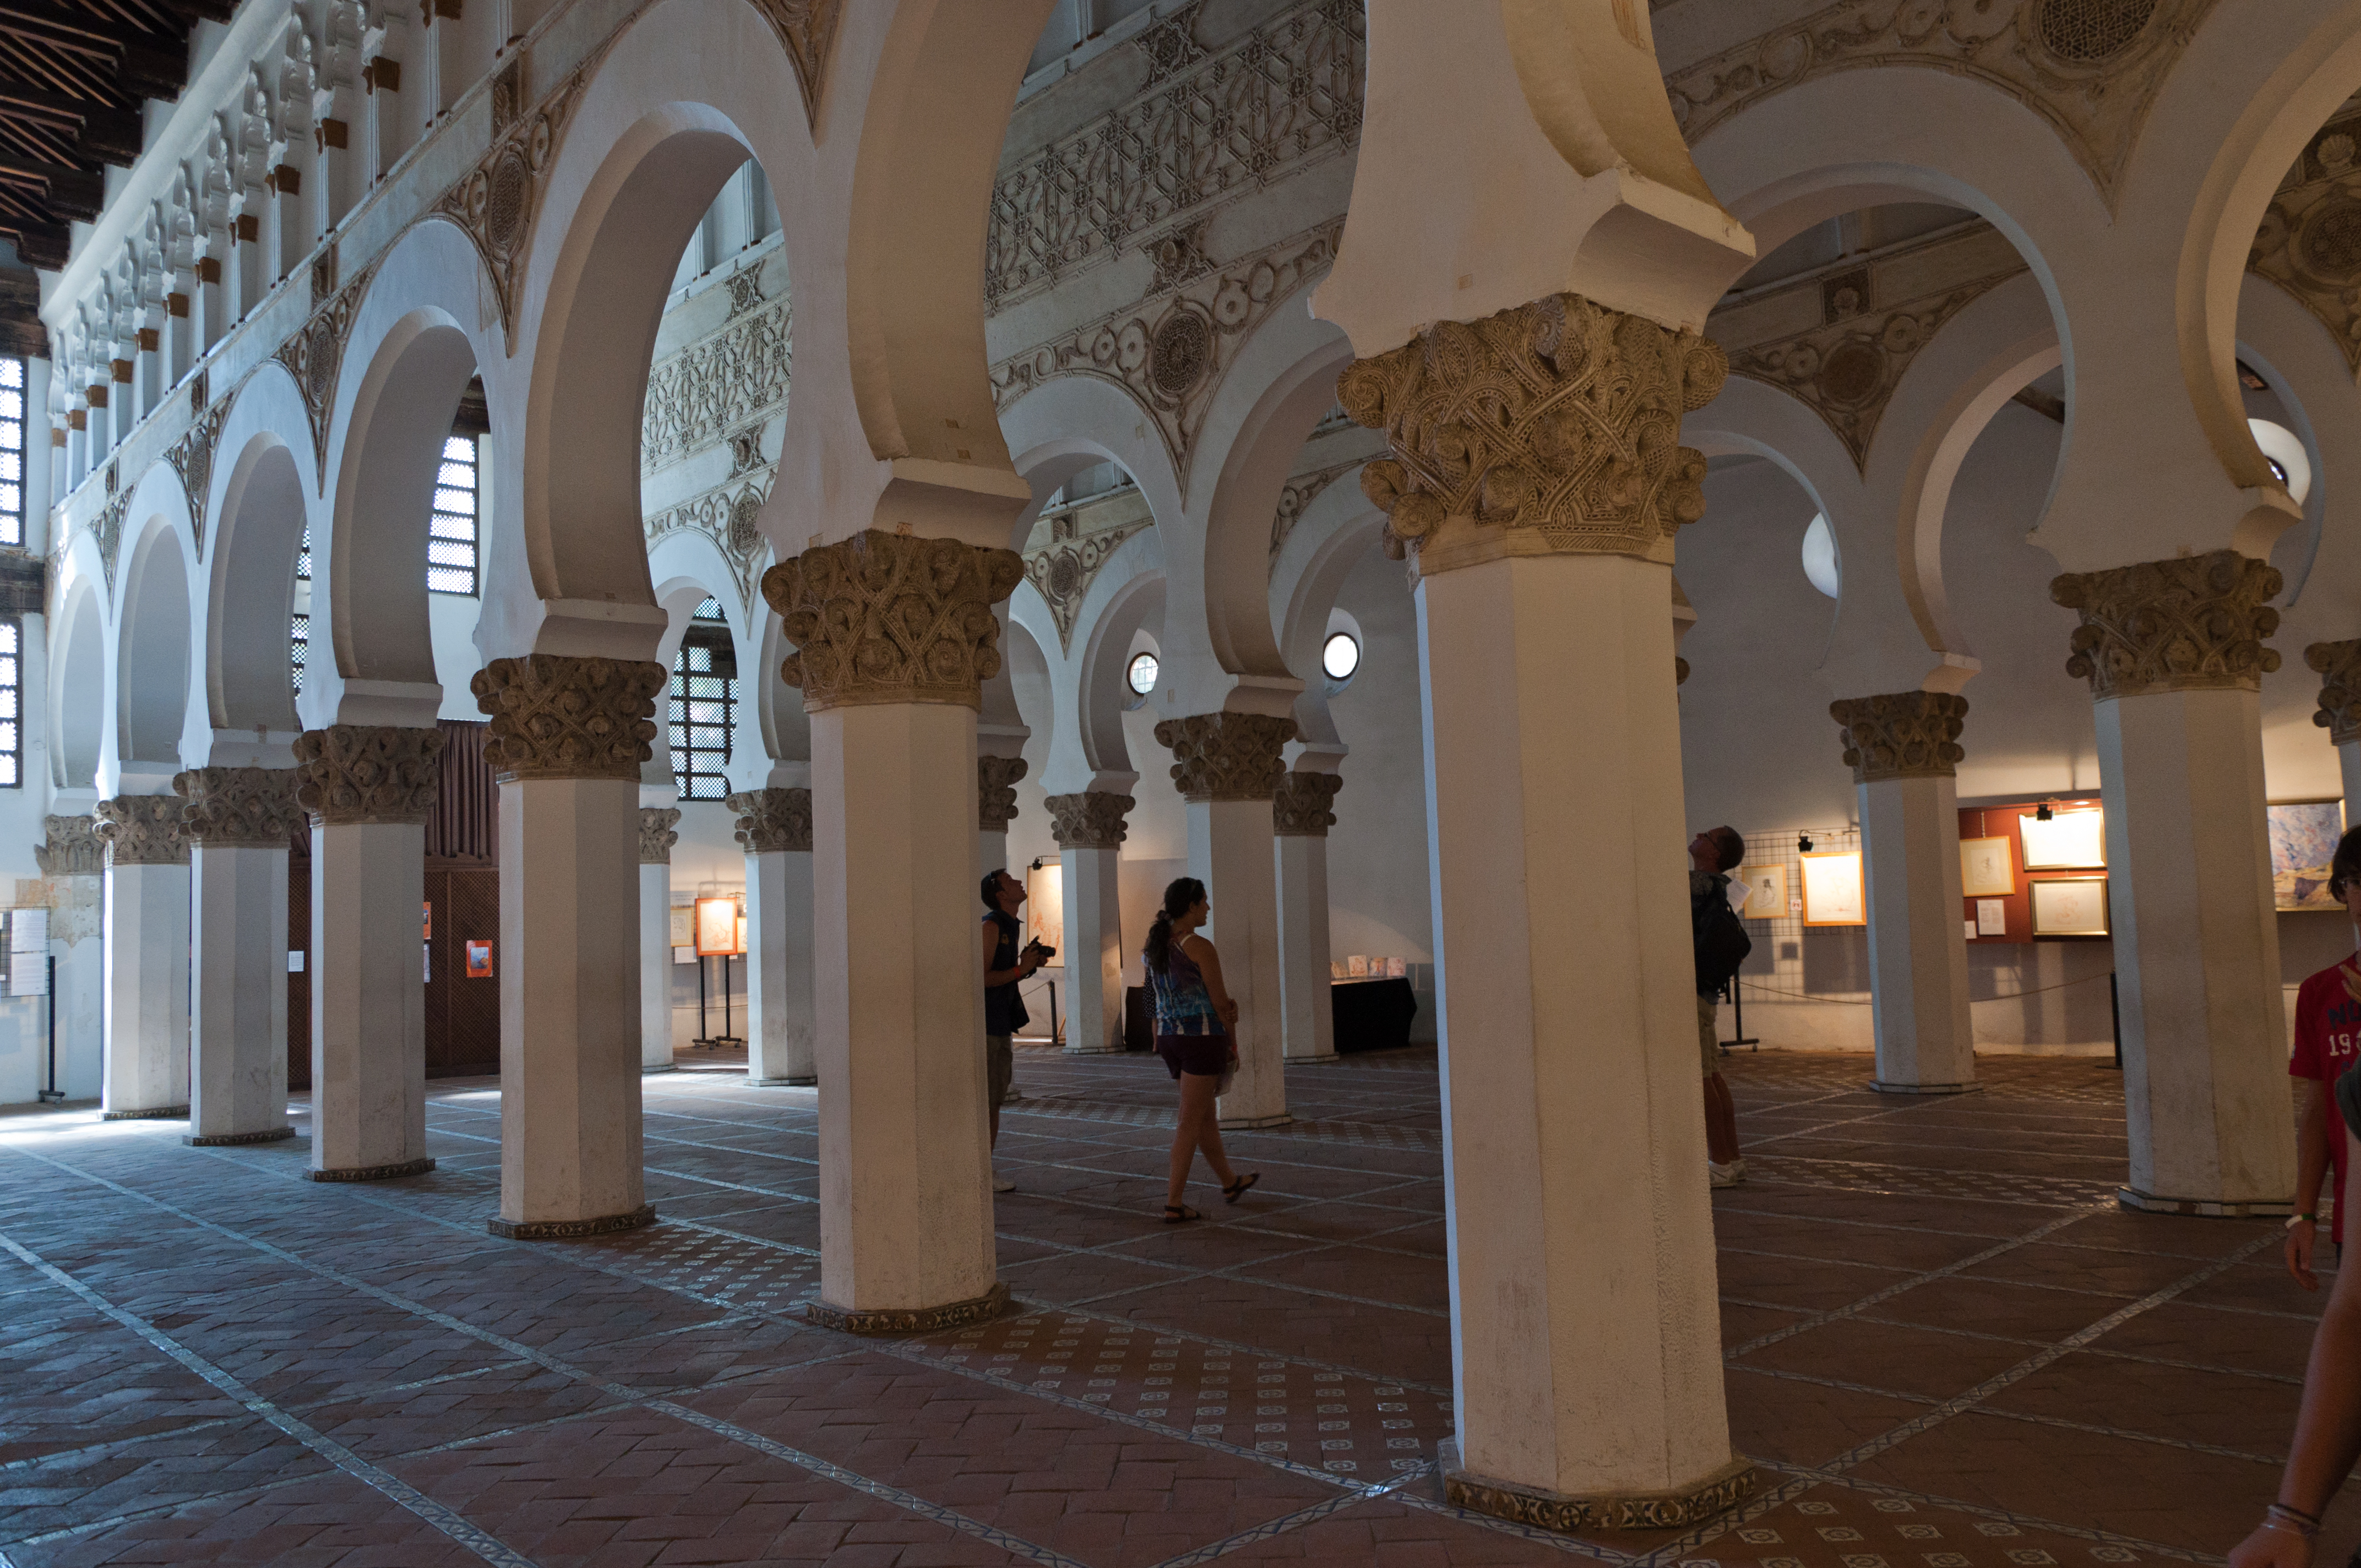 File:Toledo, Santa María la Blanca-1.jpg - Wikimedia Commons